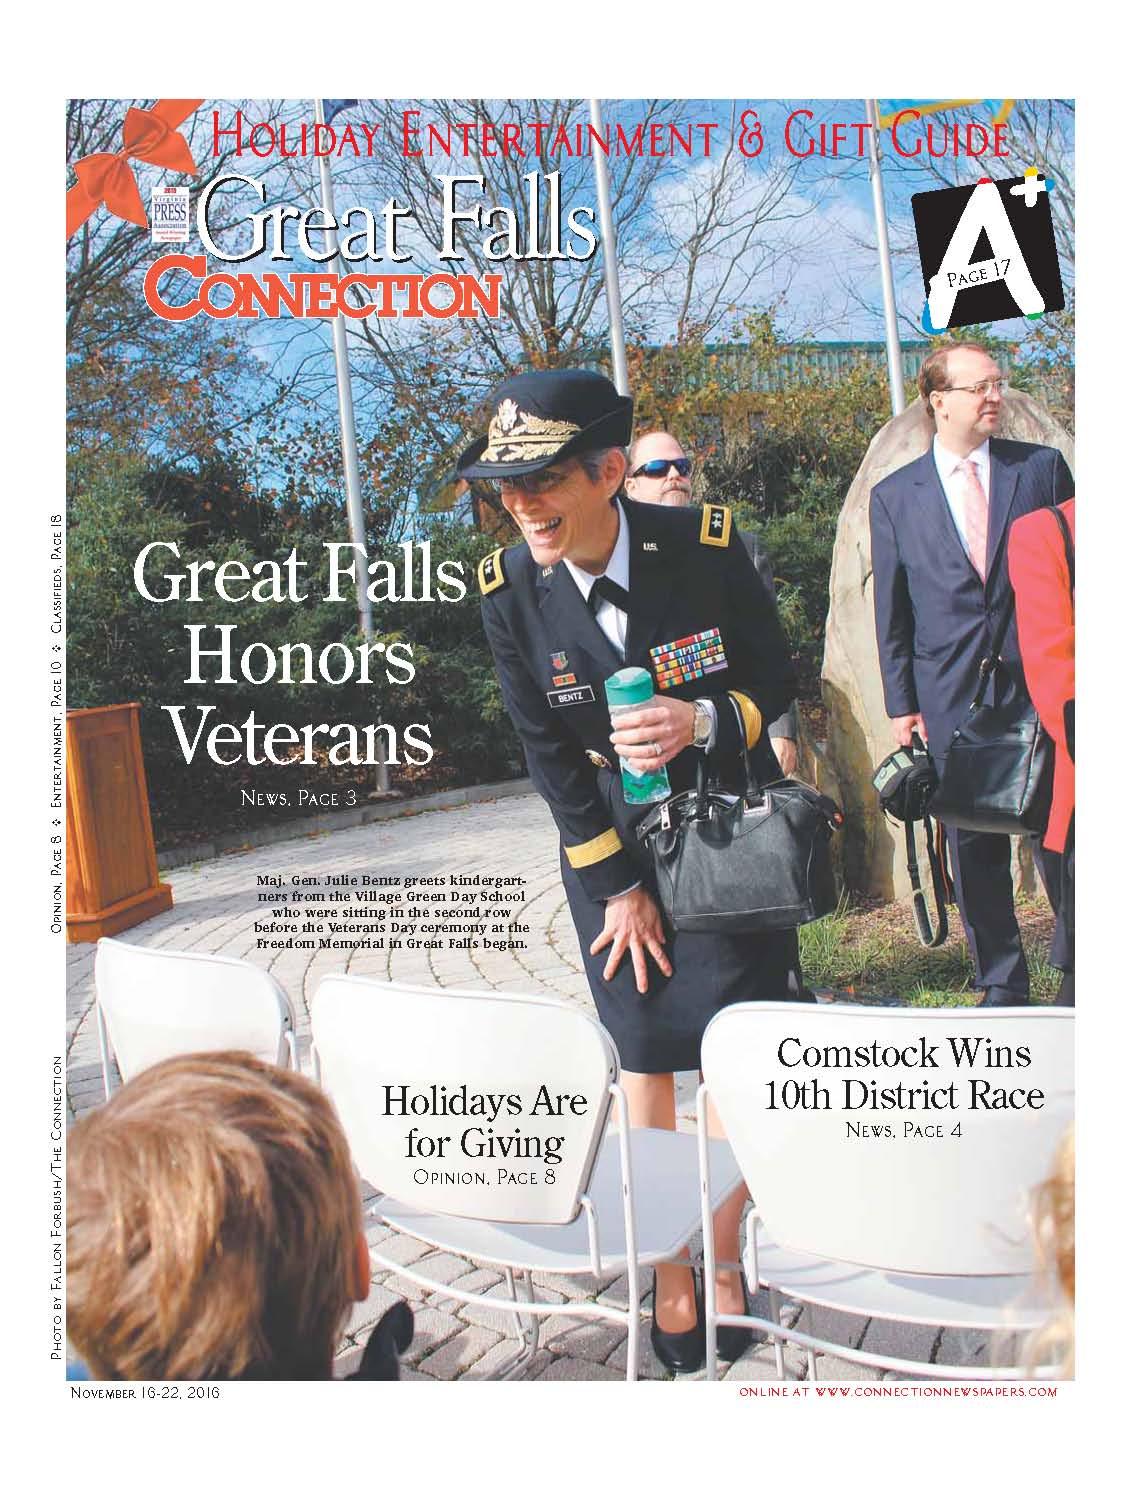 Great Falls Connection, November 16, 2016